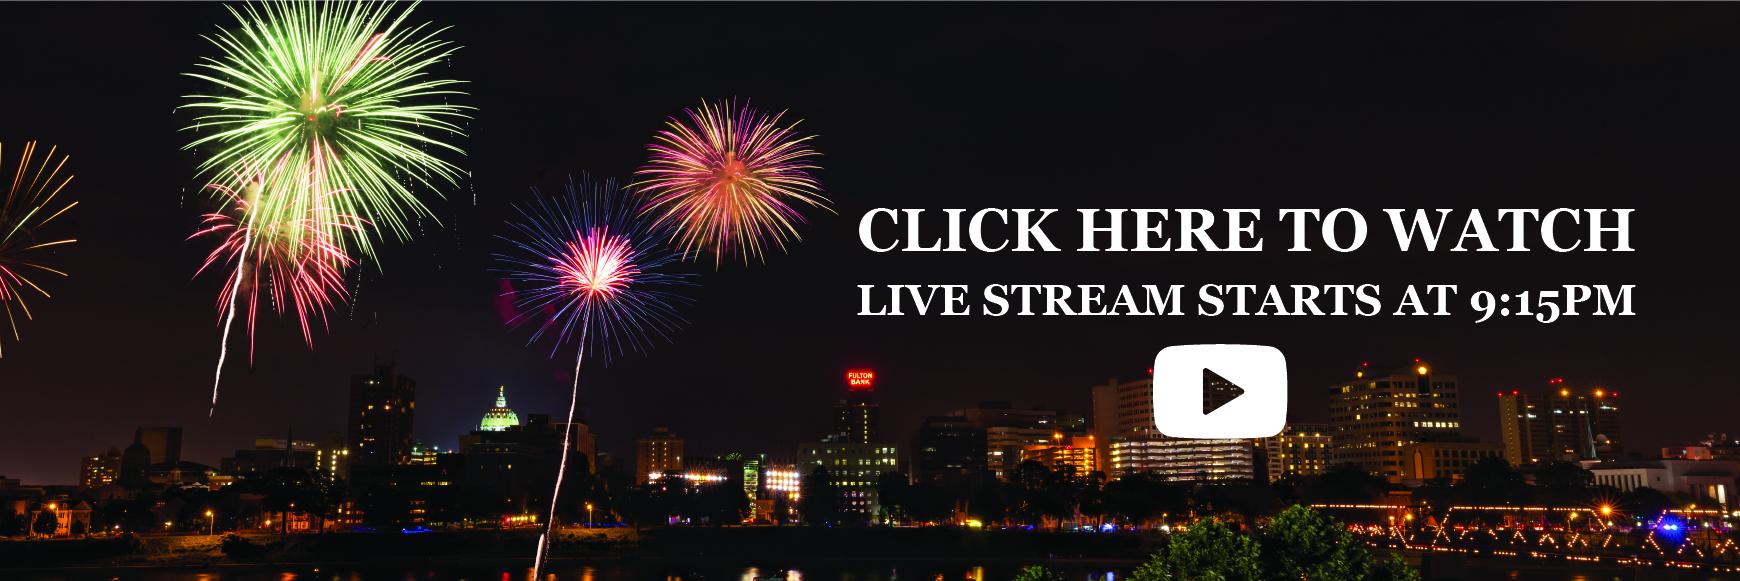 fireworks web banner